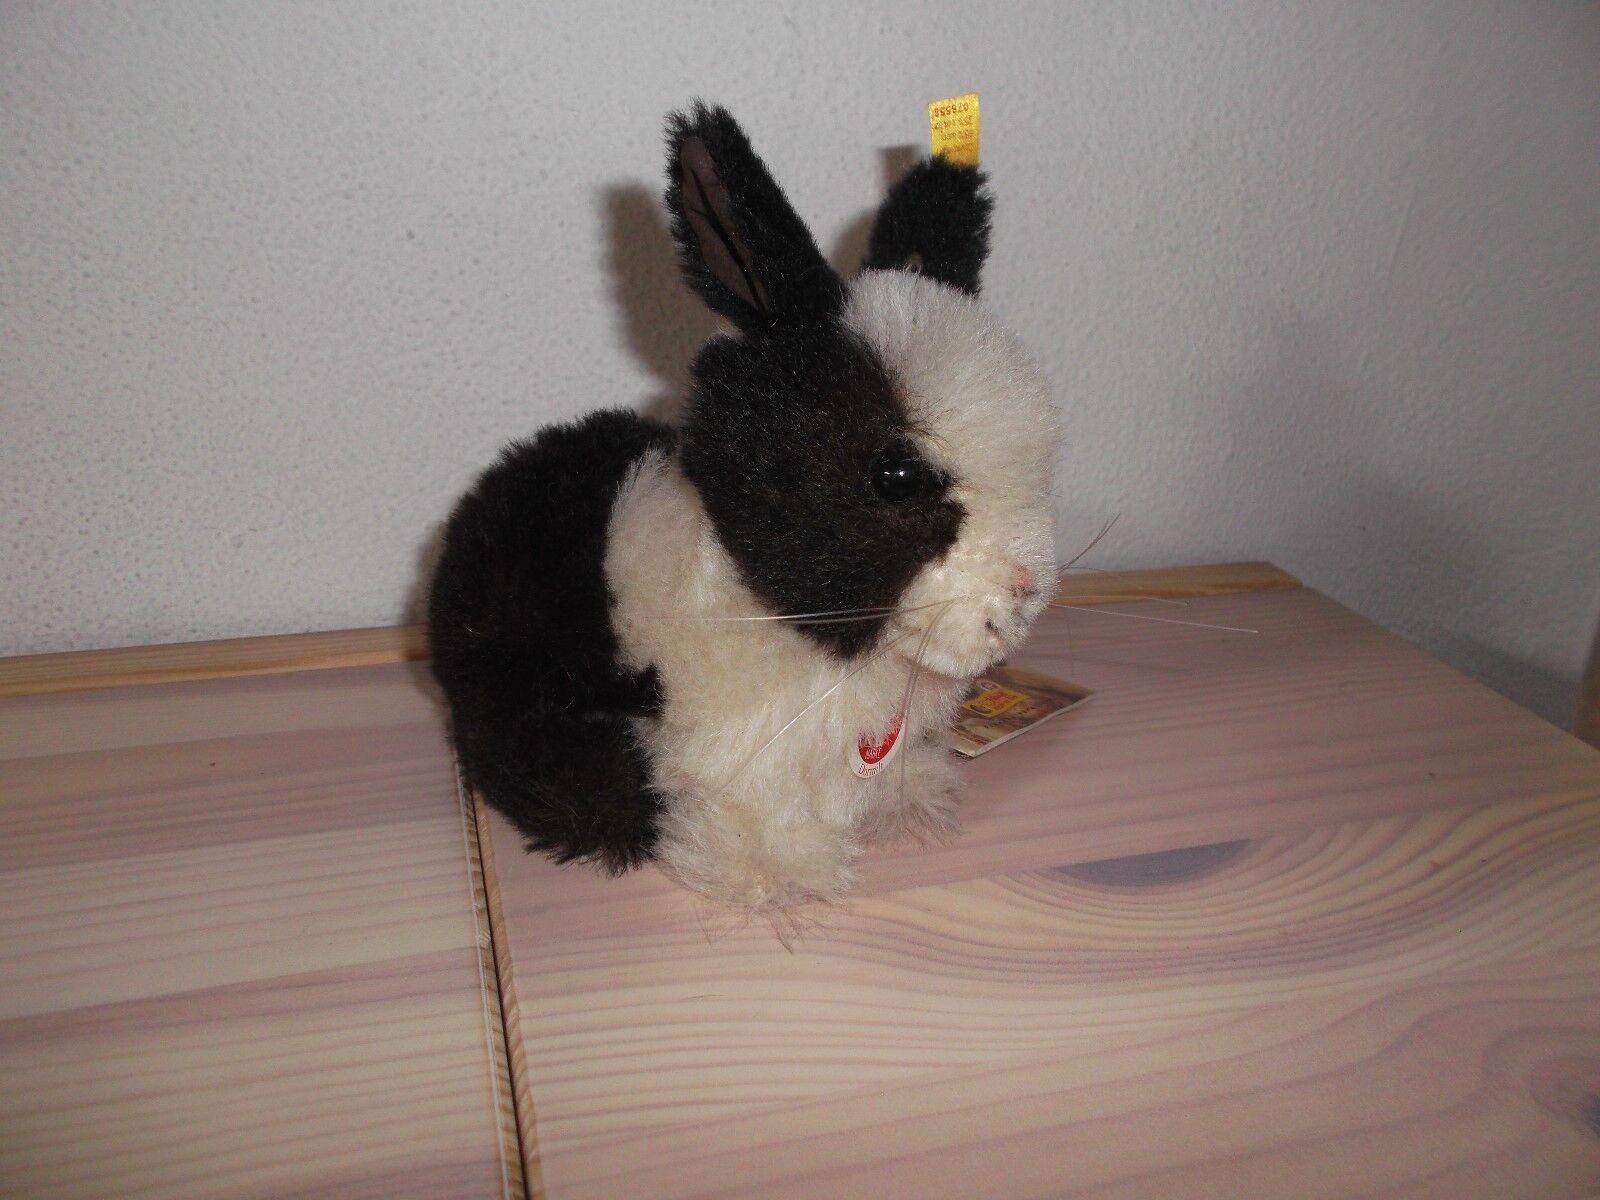 Steiff Hase Dormili Alpaca NEU m. Etikett 12 cm gross schwarz-weiss Rarität